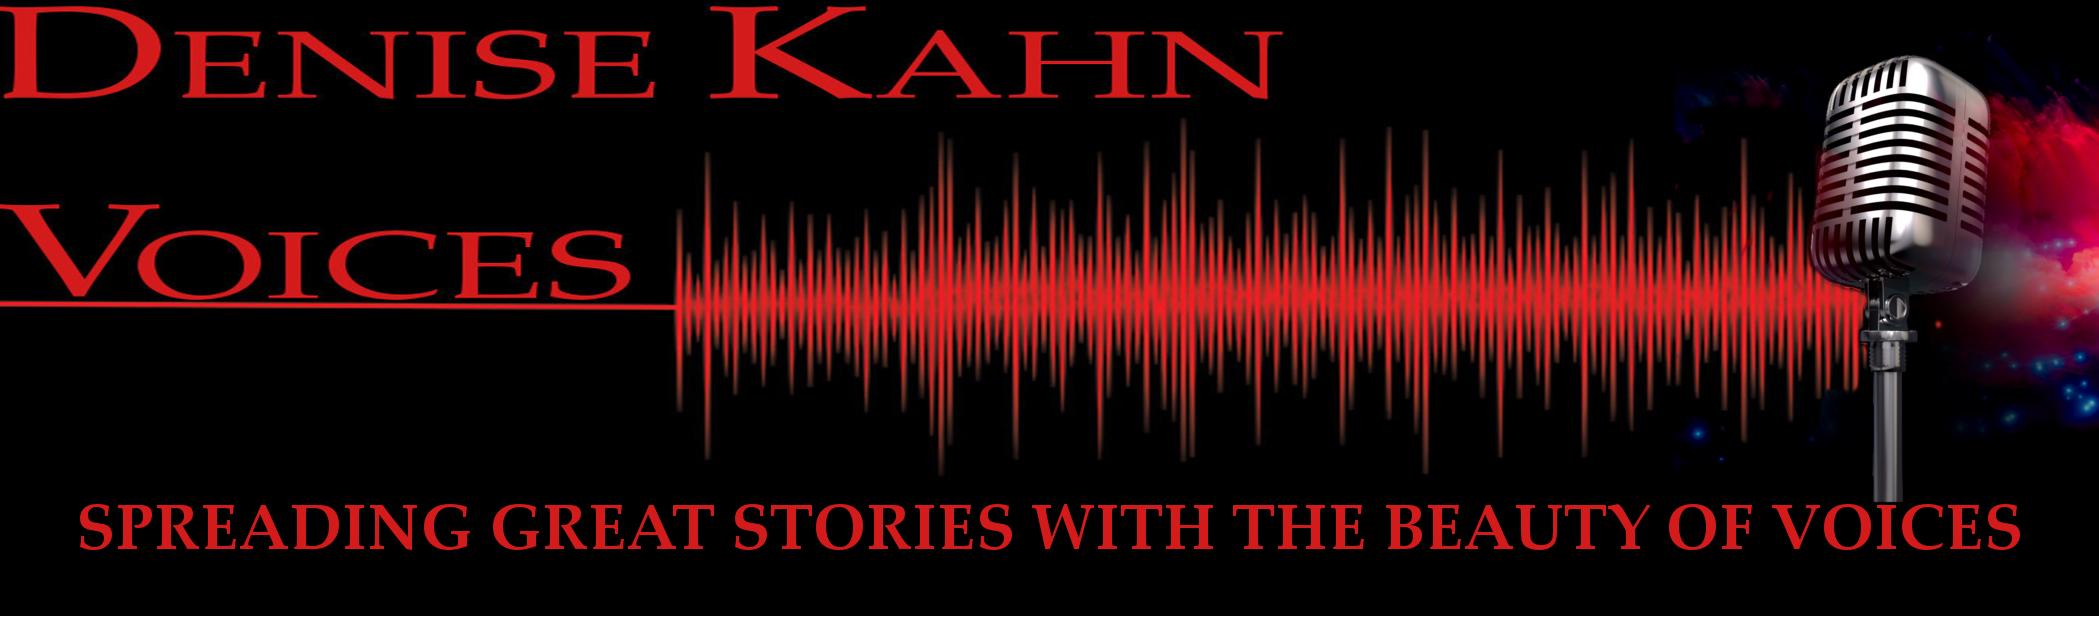 Denise Kahn Voices